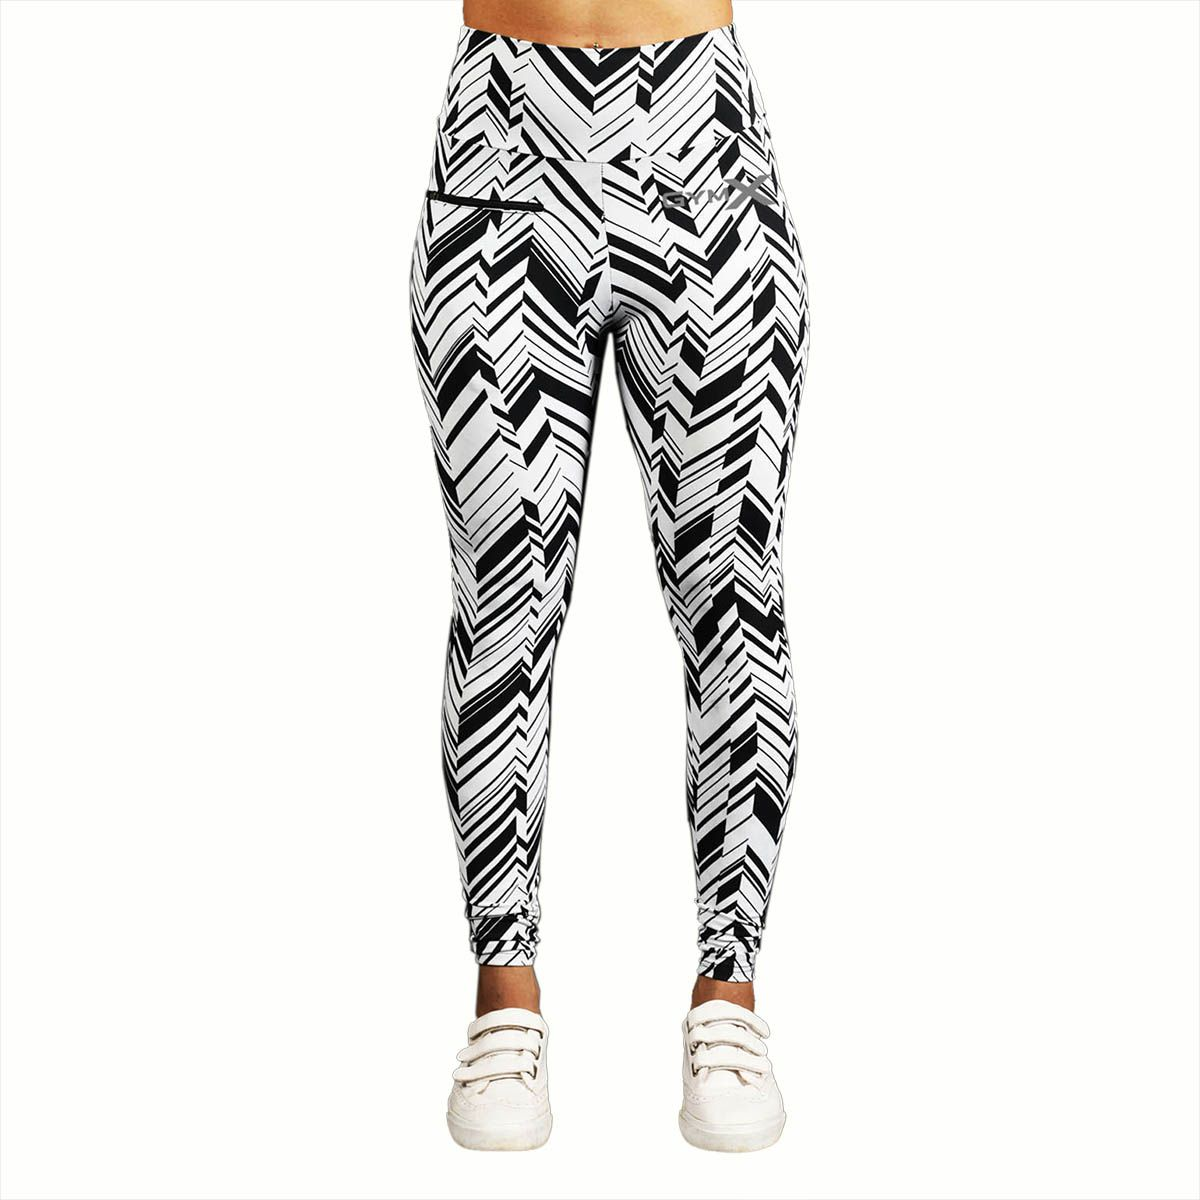 GymX Womens Polyester Allure Leggings:Monocrome